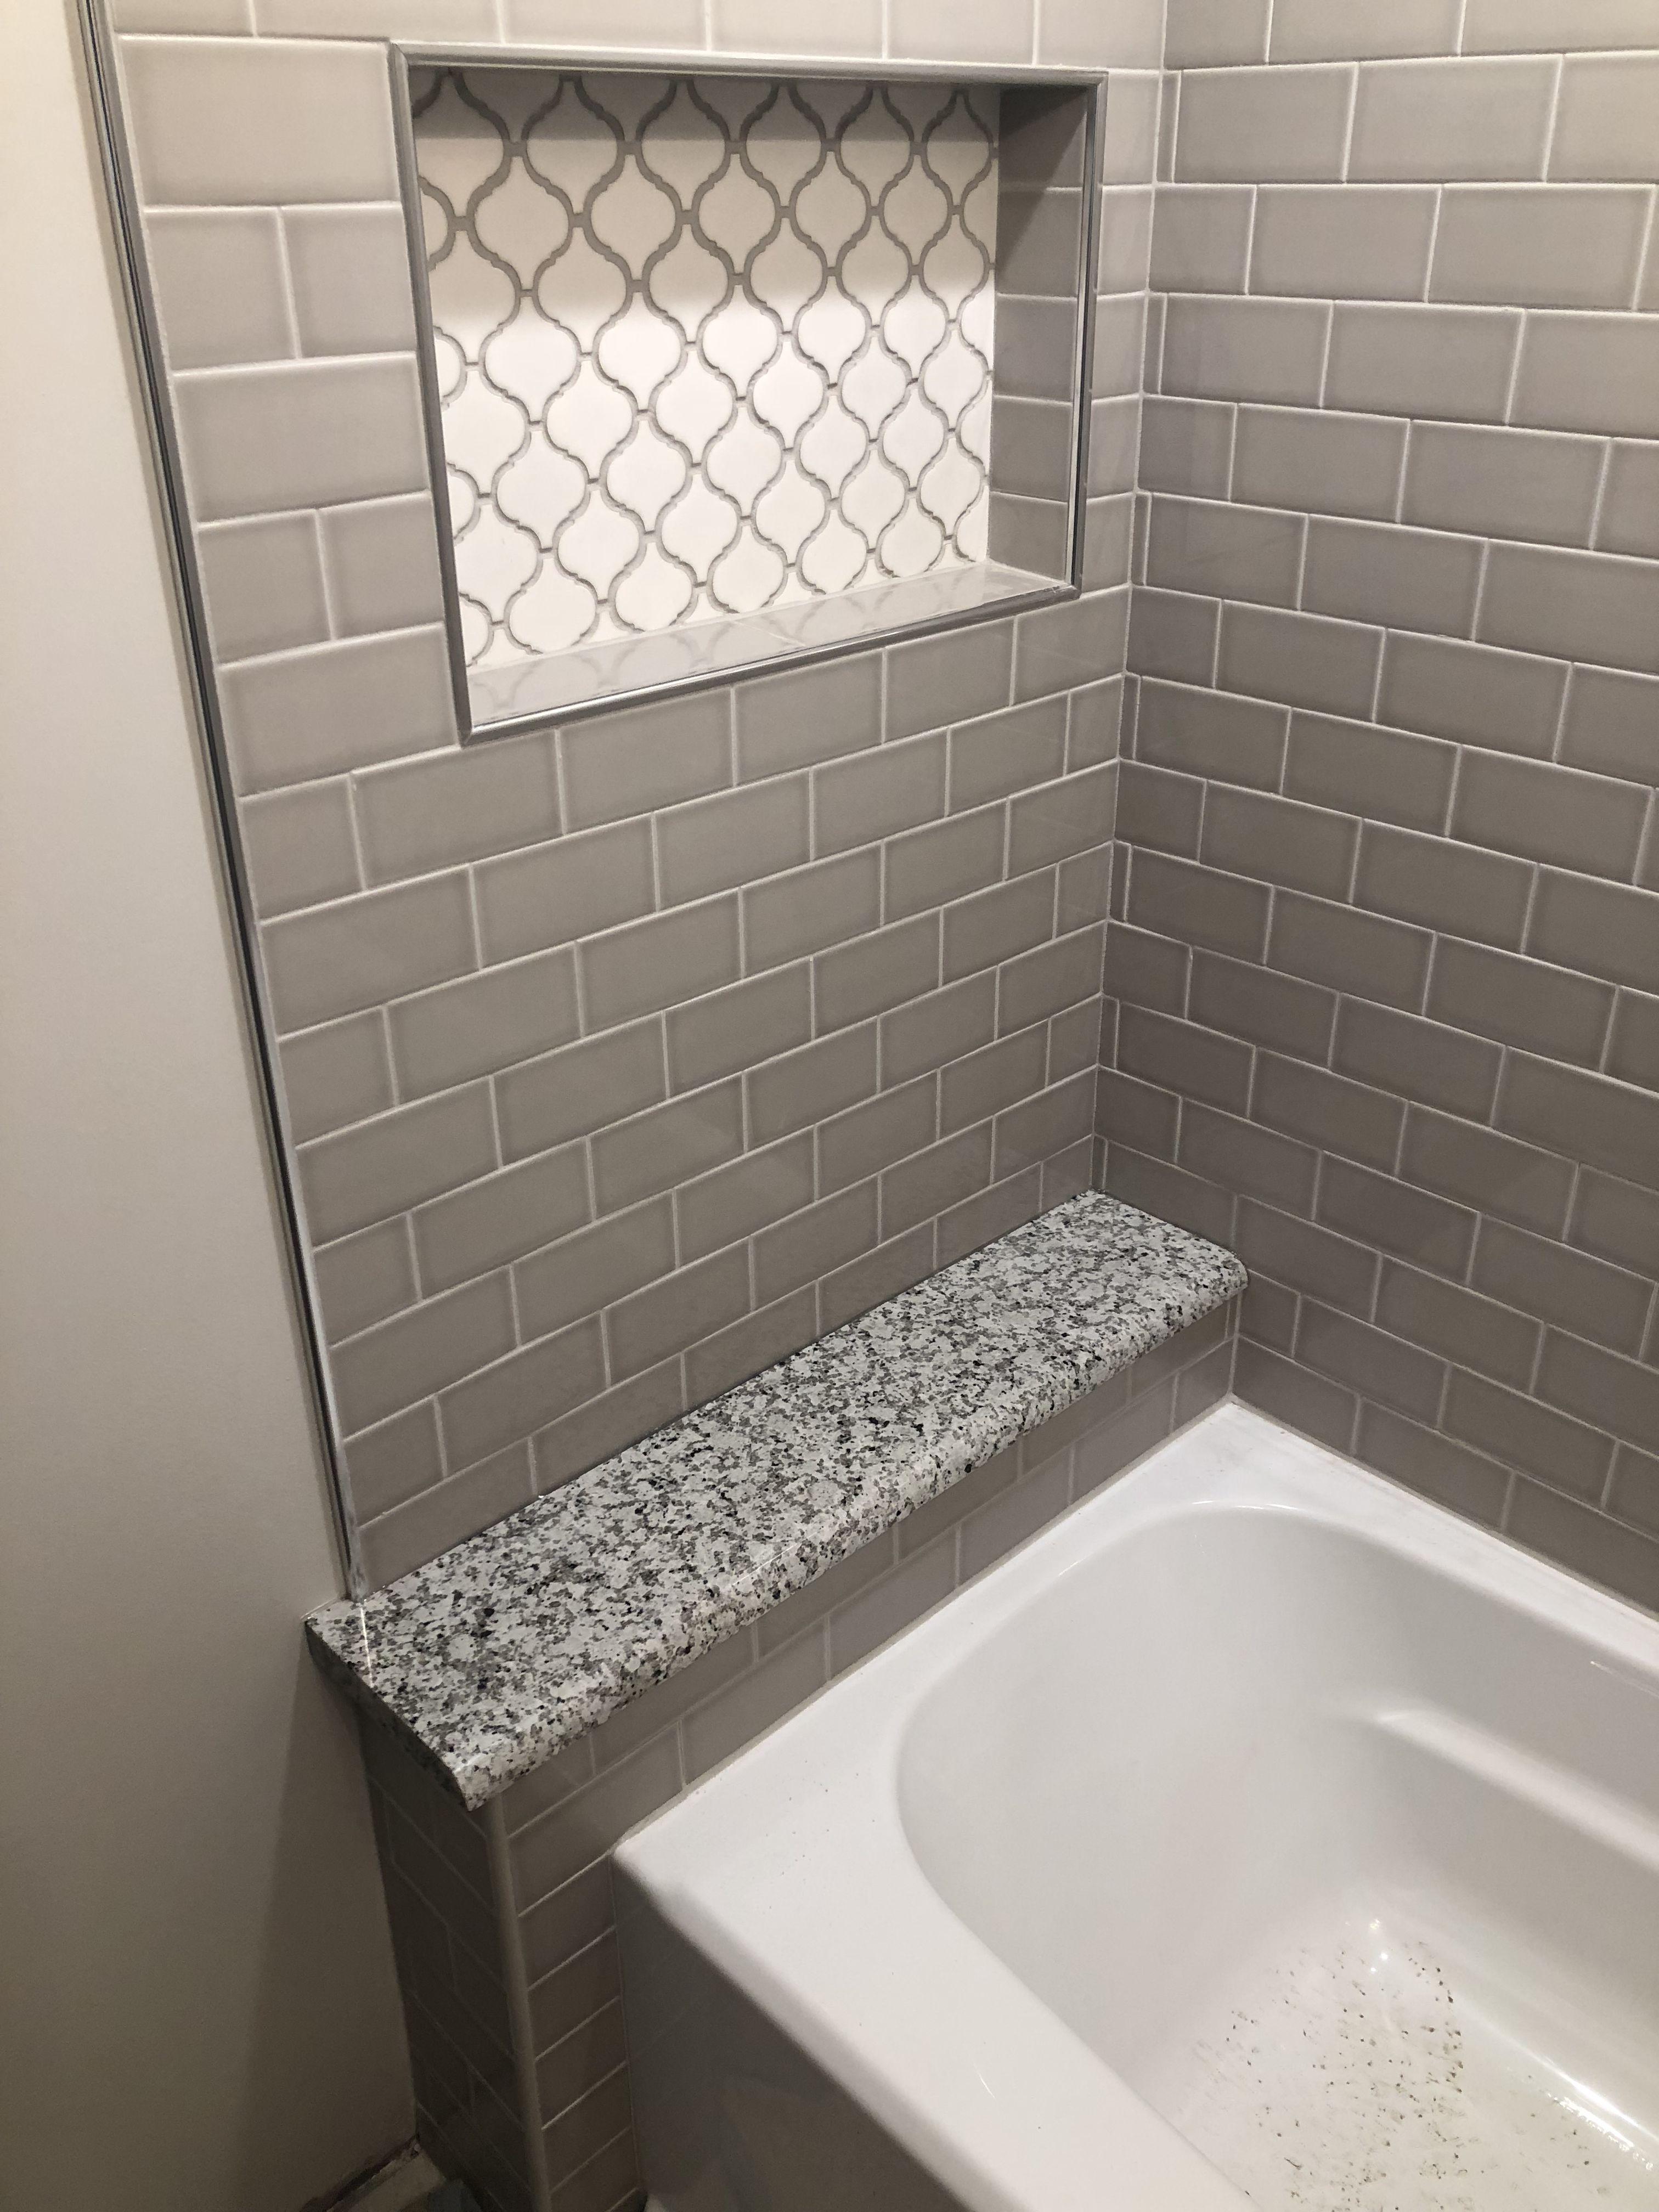 Arabesque Shower Niche And Pearl Gray Subway Tile Bathtub